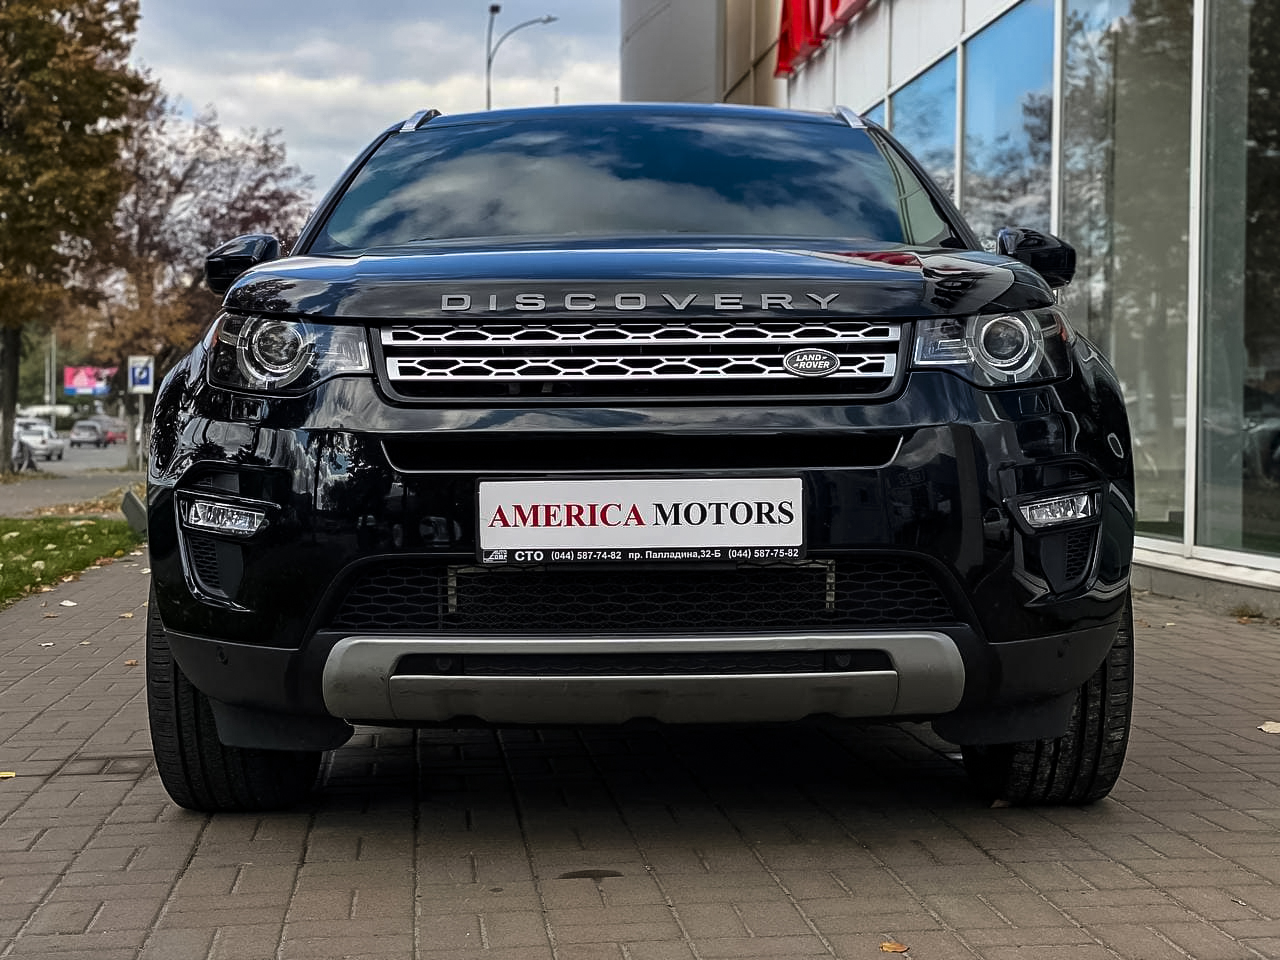 2015 Land Rover Discovery Sport   Vin: SALCR2BG2GH565637